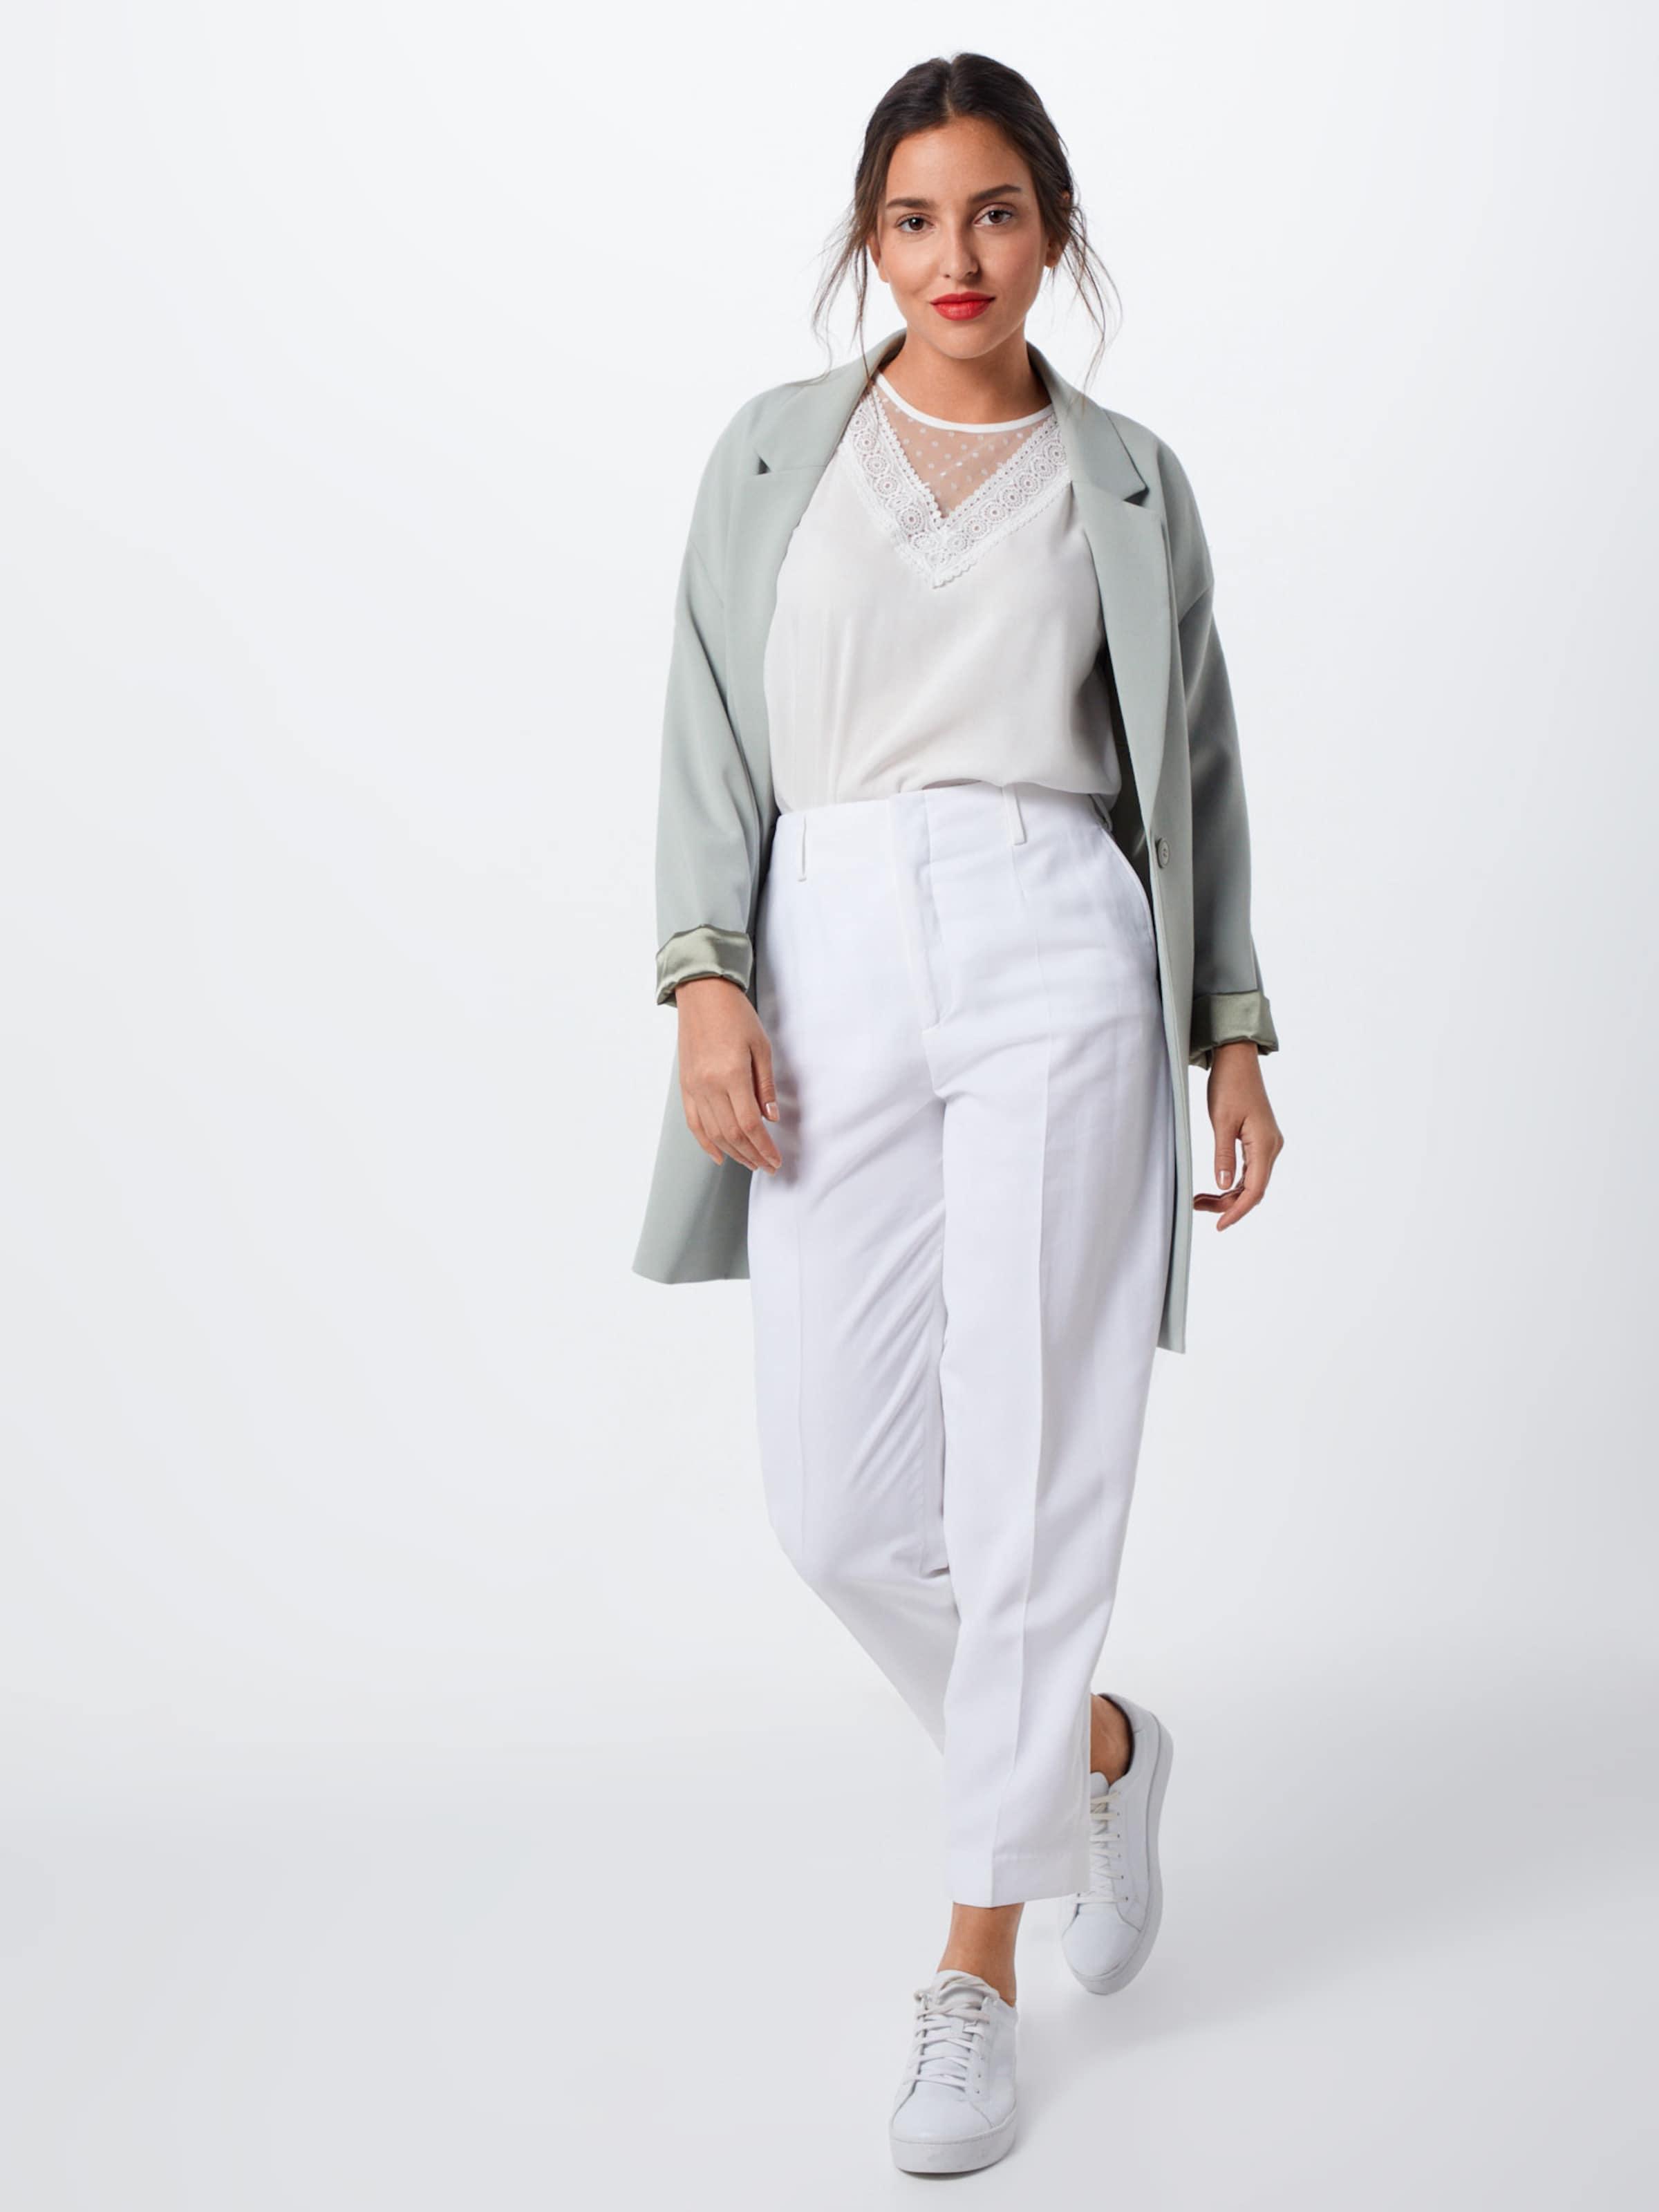 Chemisier Blanc Broadway Nyc Fashion En 'pensie' 0NZnk8PXwO